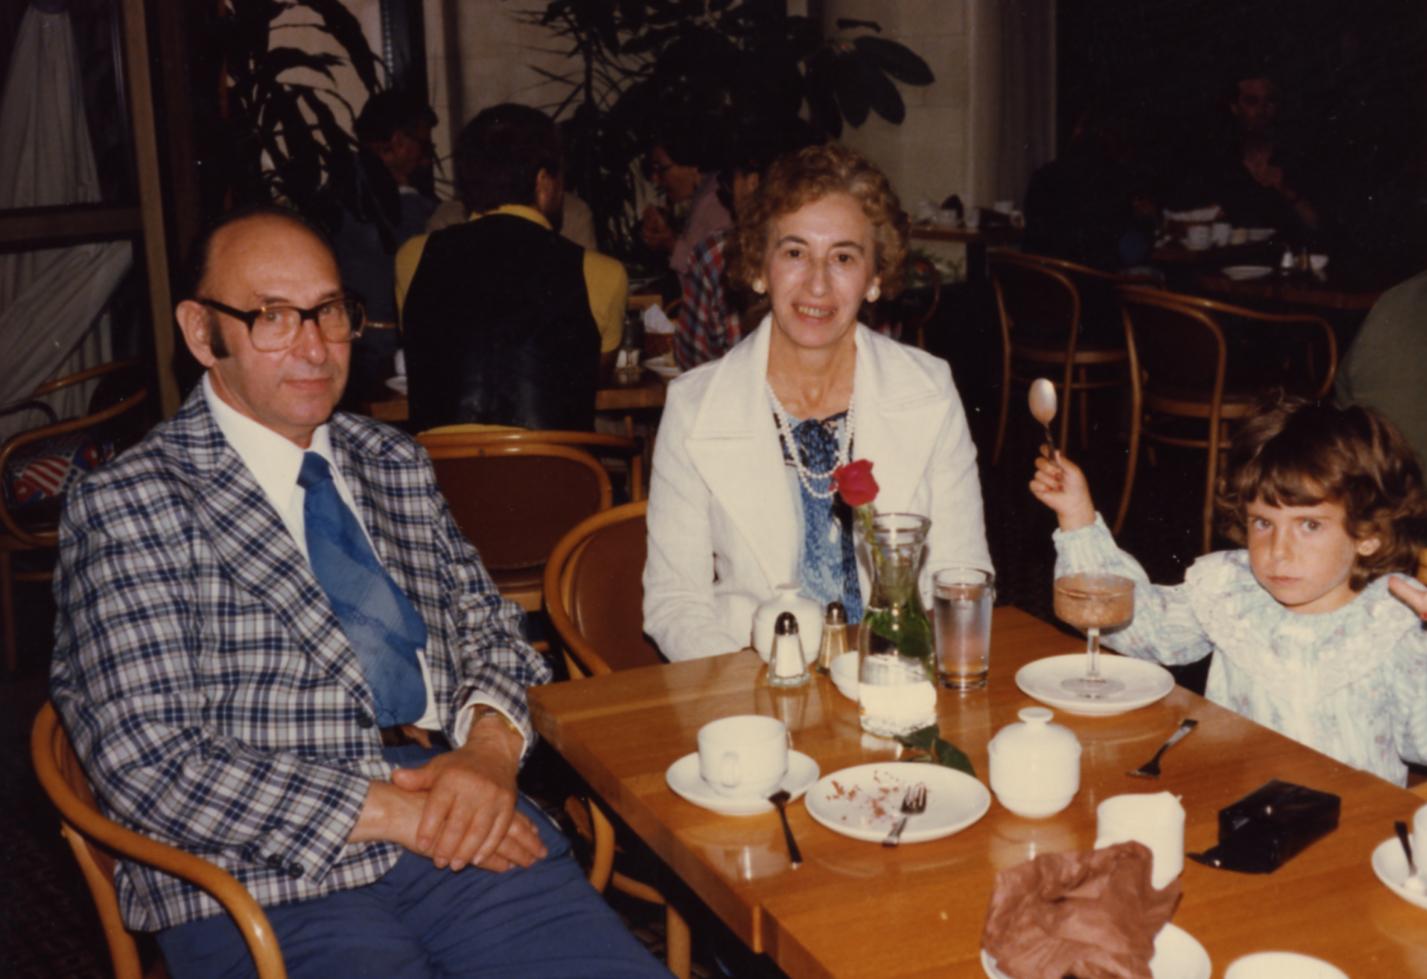 Elsa Thon larger image and caption